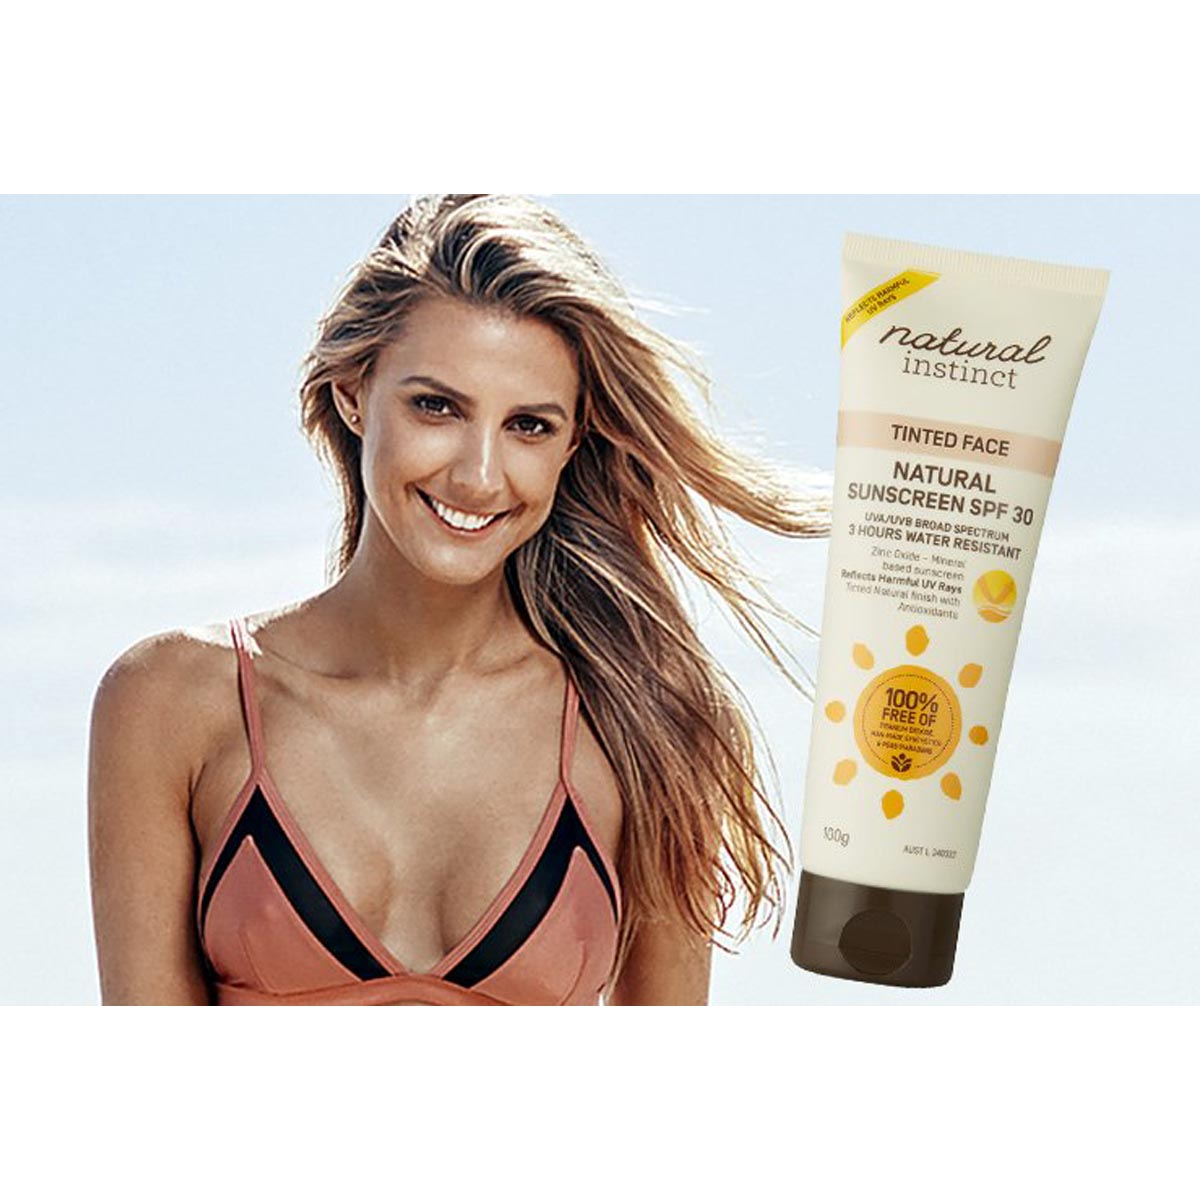 Natural Instinct Sunscreen Tinted Face 100g_media-03